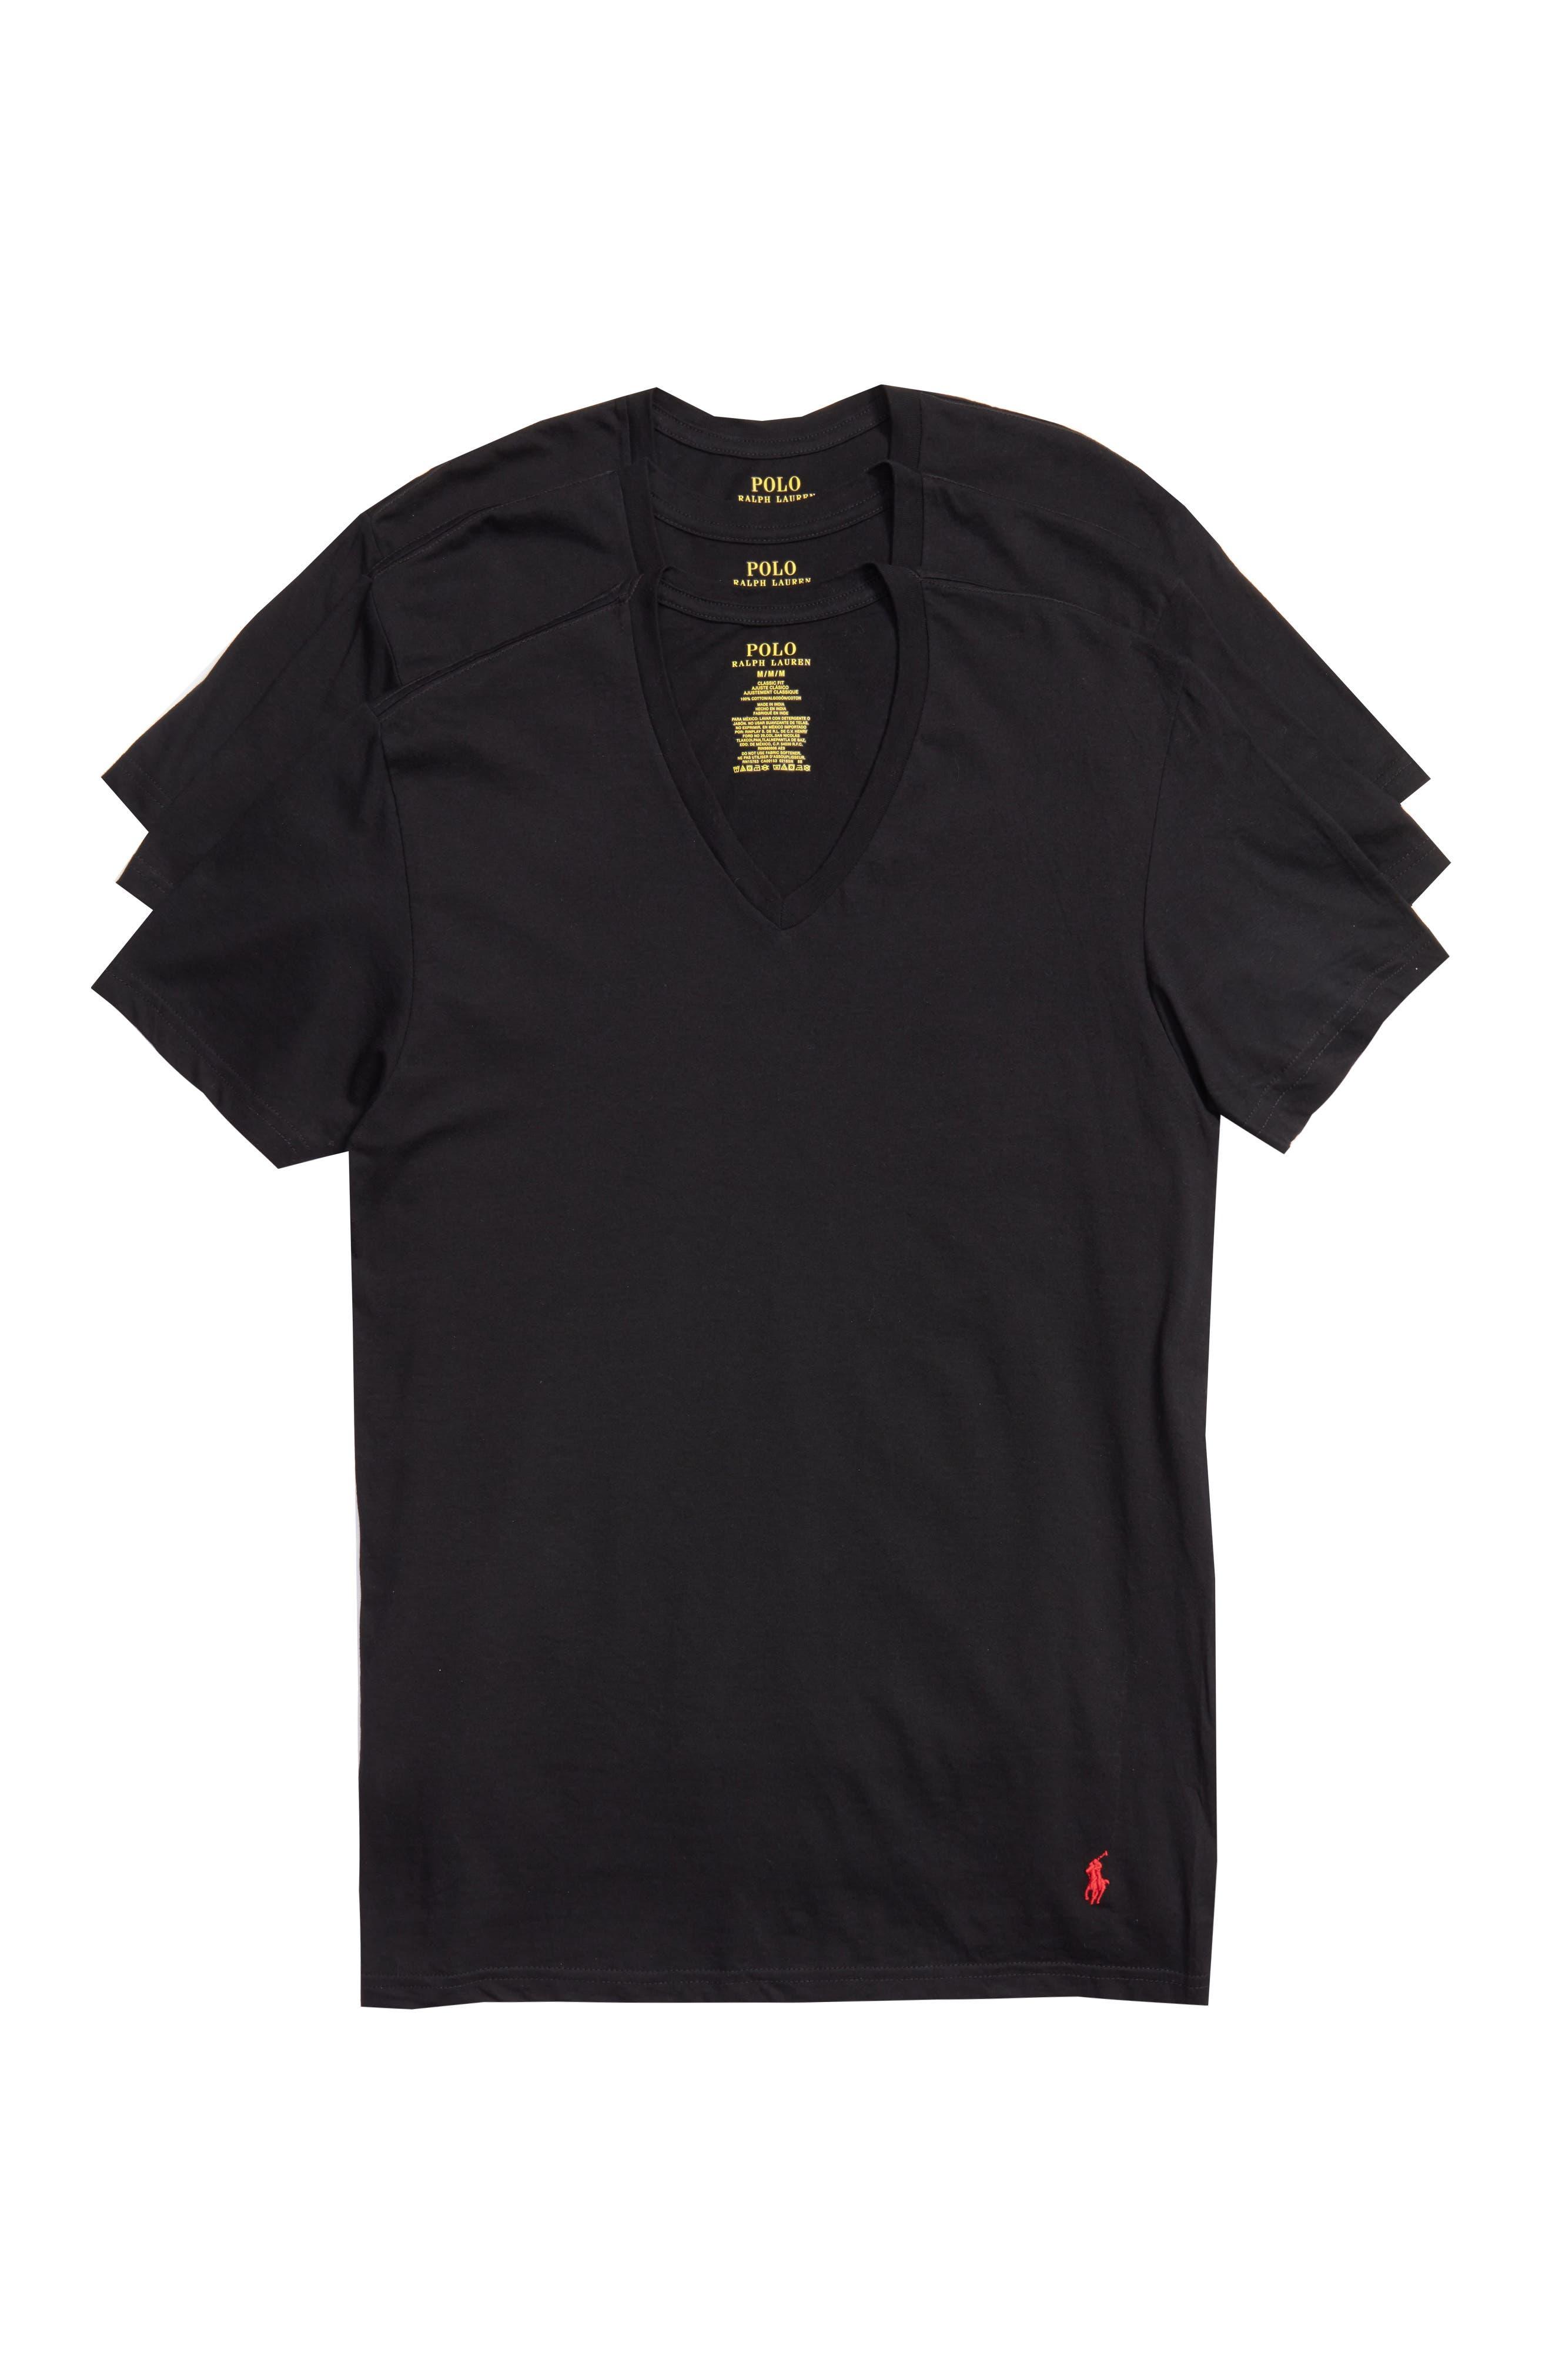 Polo Ralph Lauren 3-Pack V-Neck T-Shirts,                             Main thumbnail 1, color,                             POLO BLACK